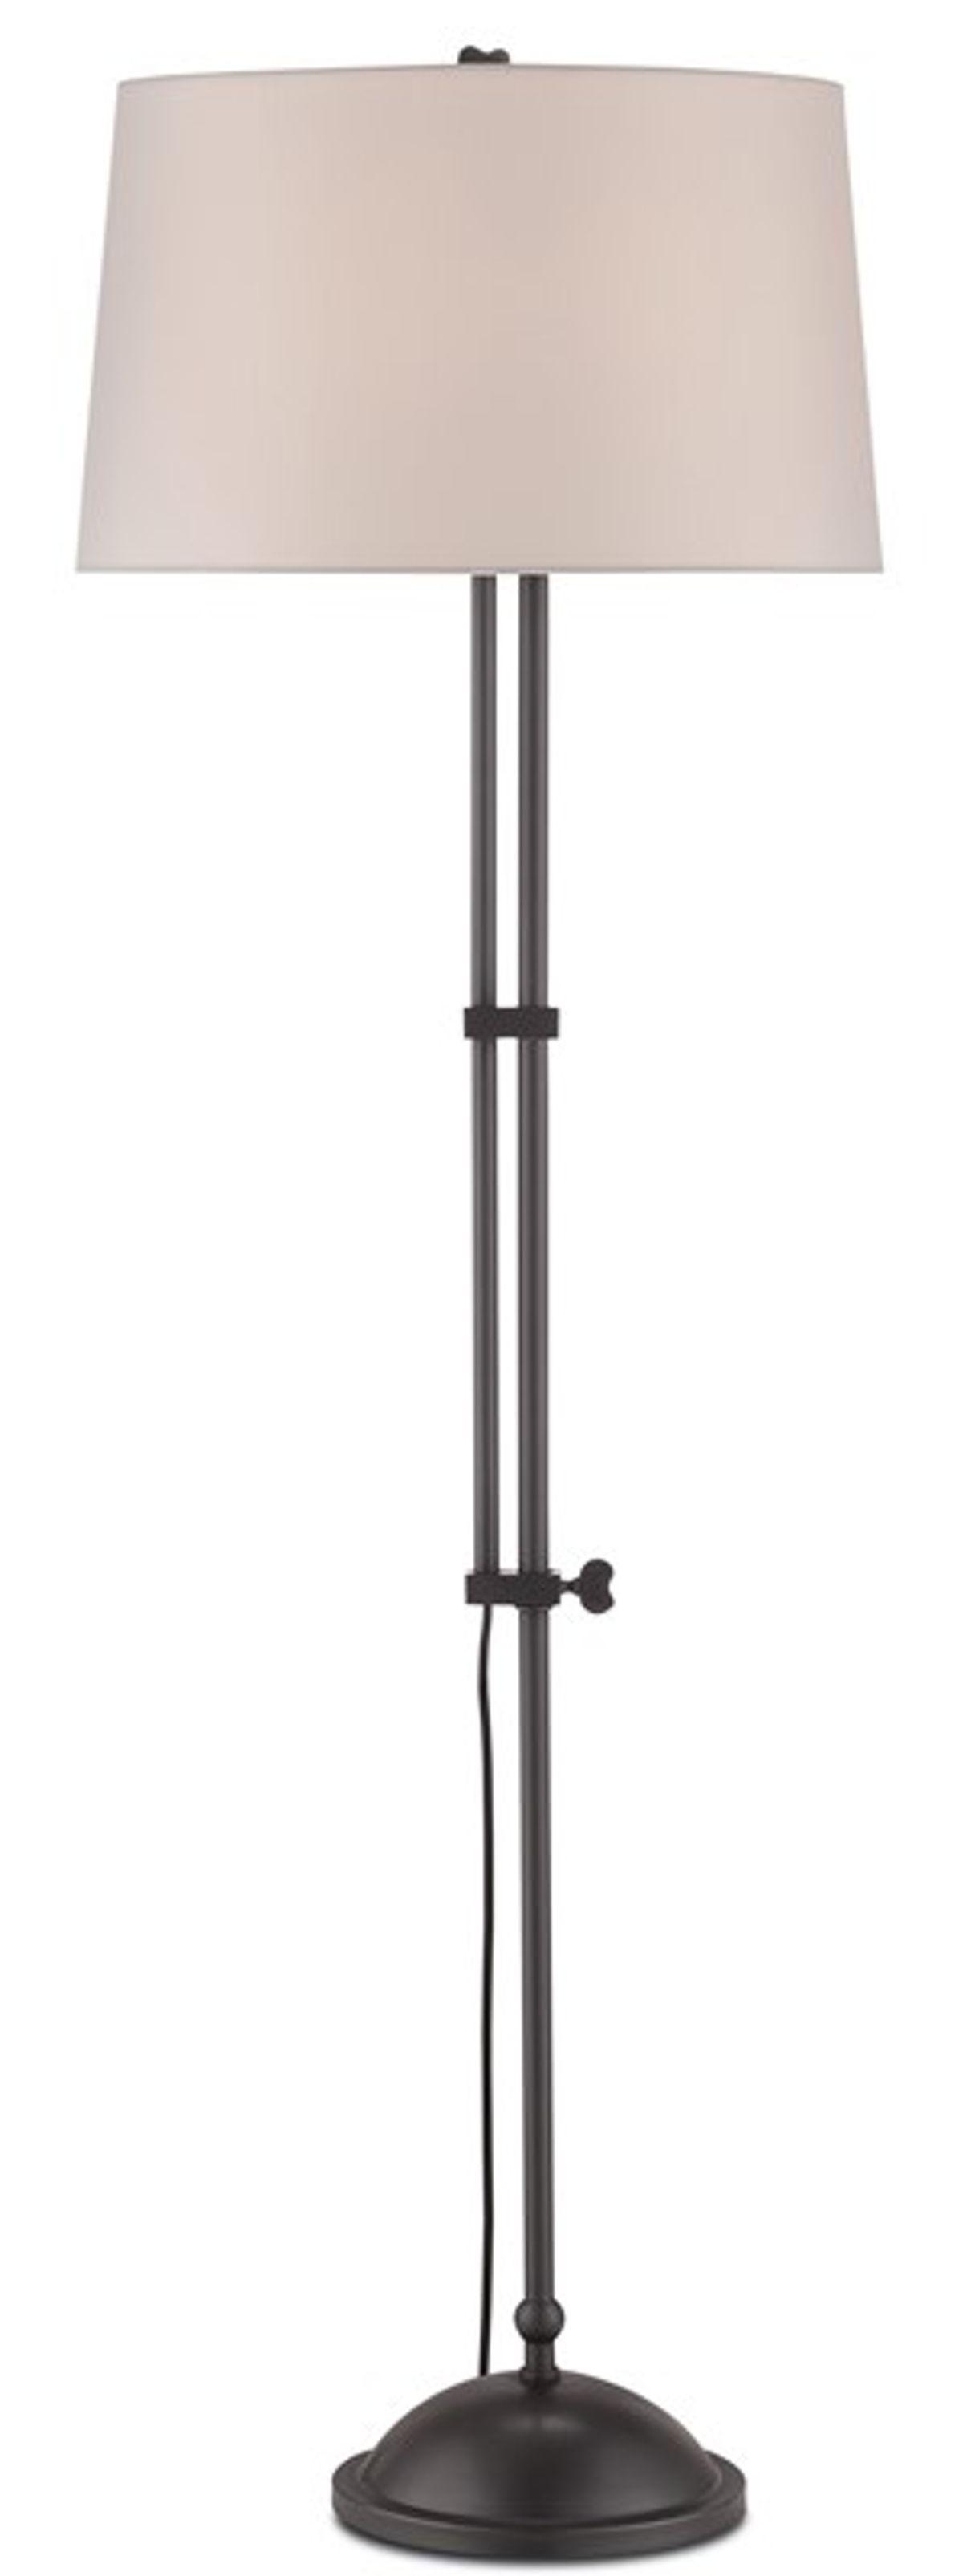 Kilby Floor Lamp